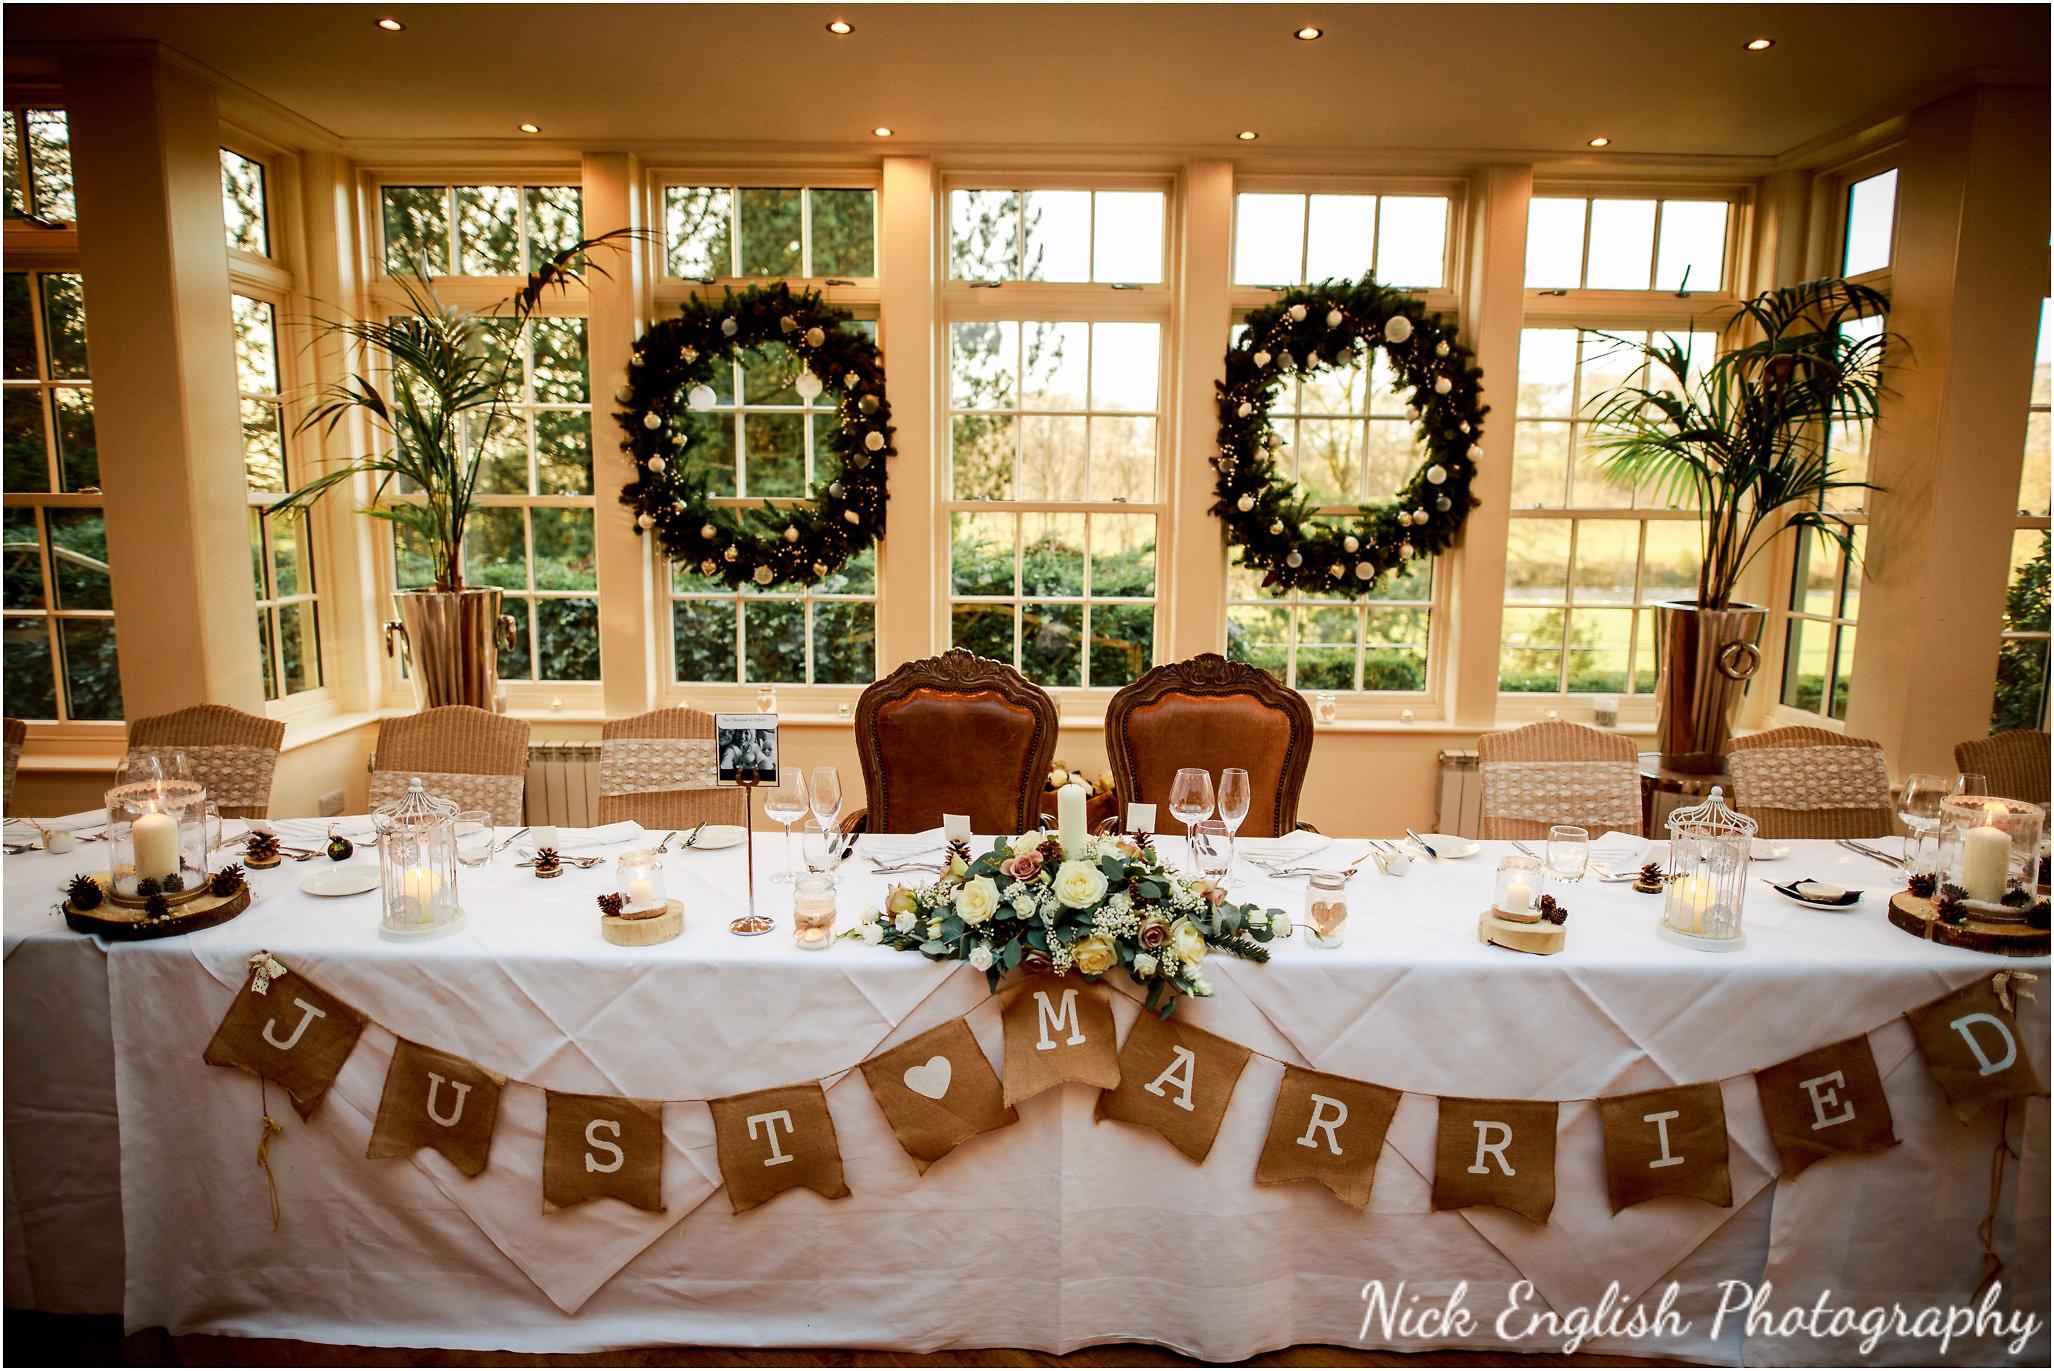 Mitton Hall Wedding Breakfast Room at Christmas